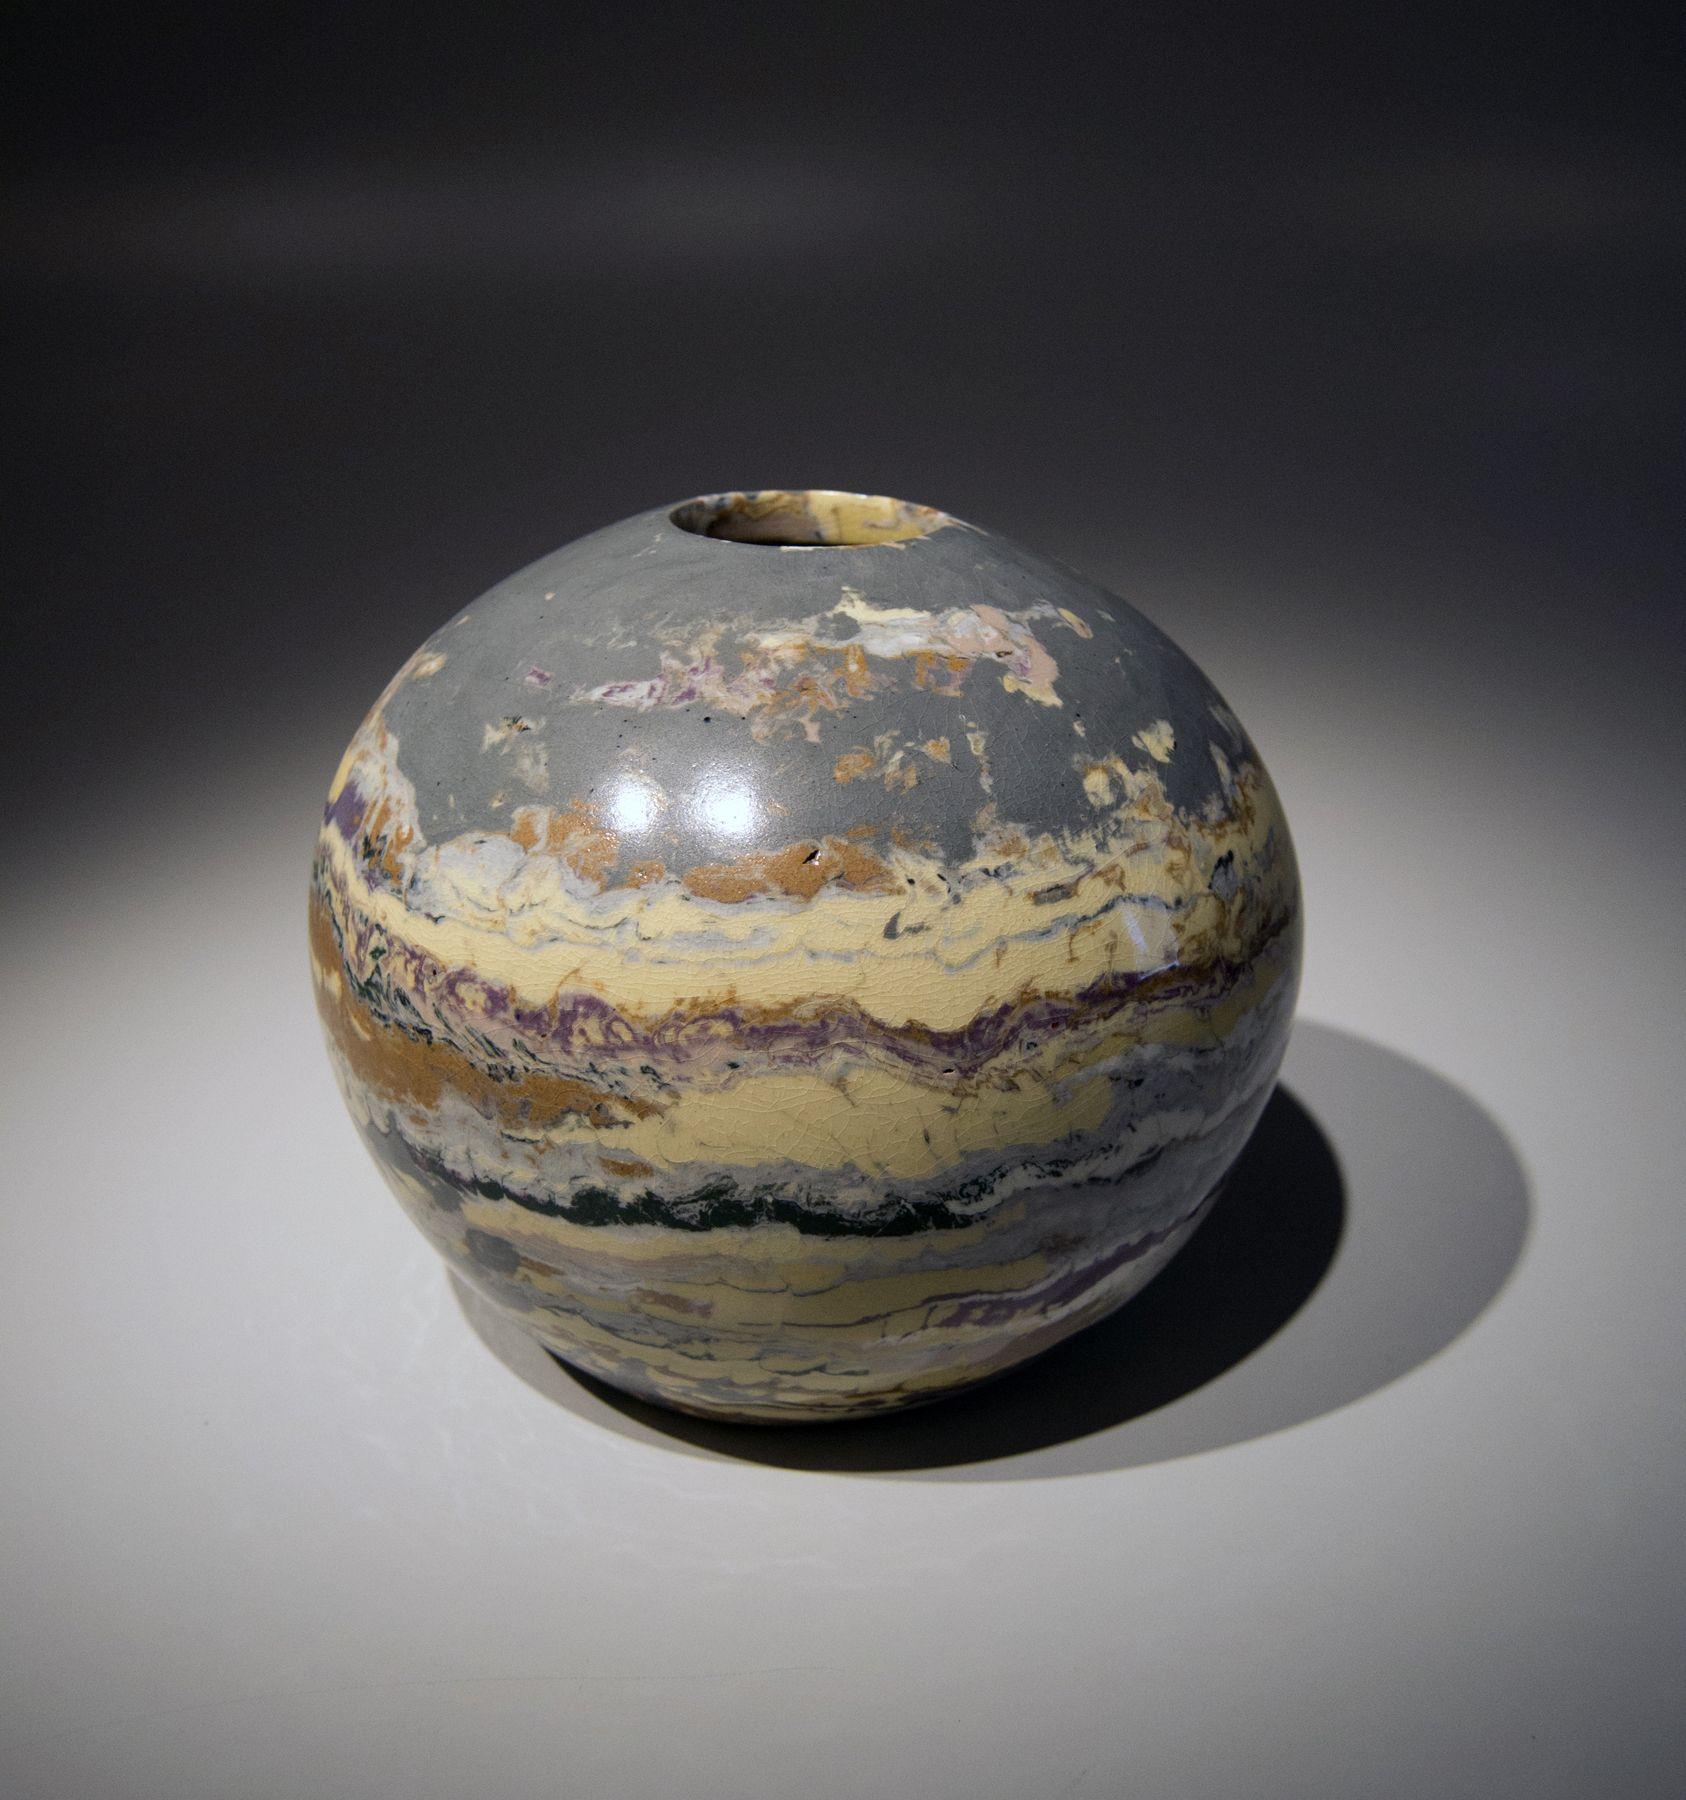 Matsui Kōsei (1927-2003), Small sphericalneriage (marbleized) vessel